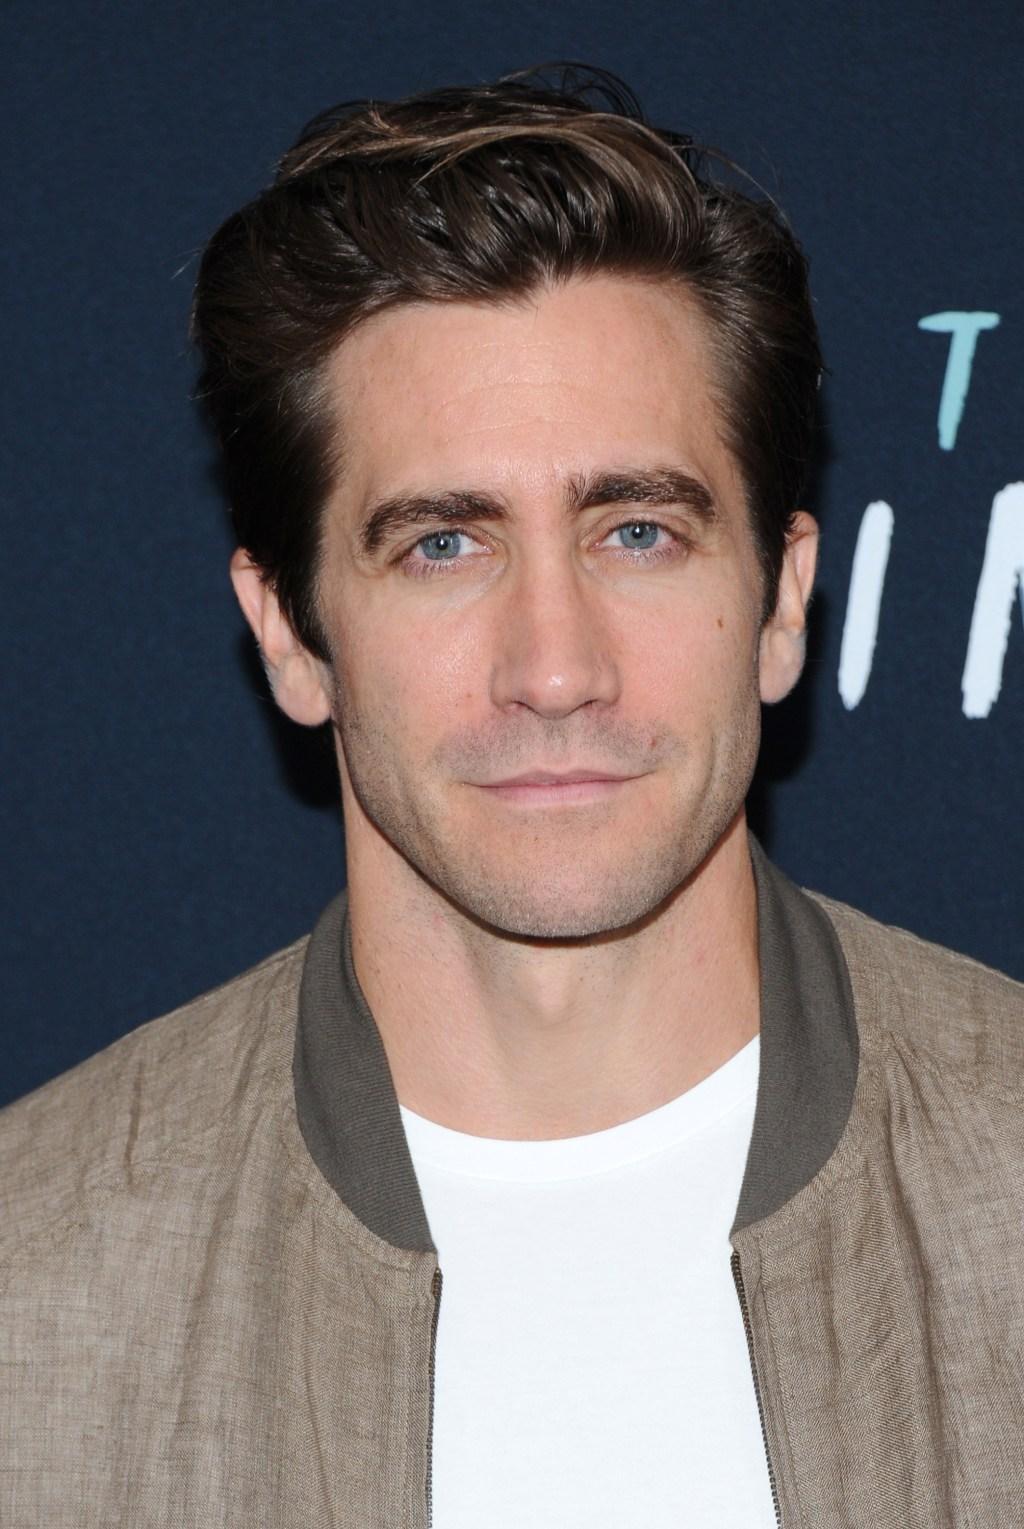 Jake Gyllenhaal cleanshaven